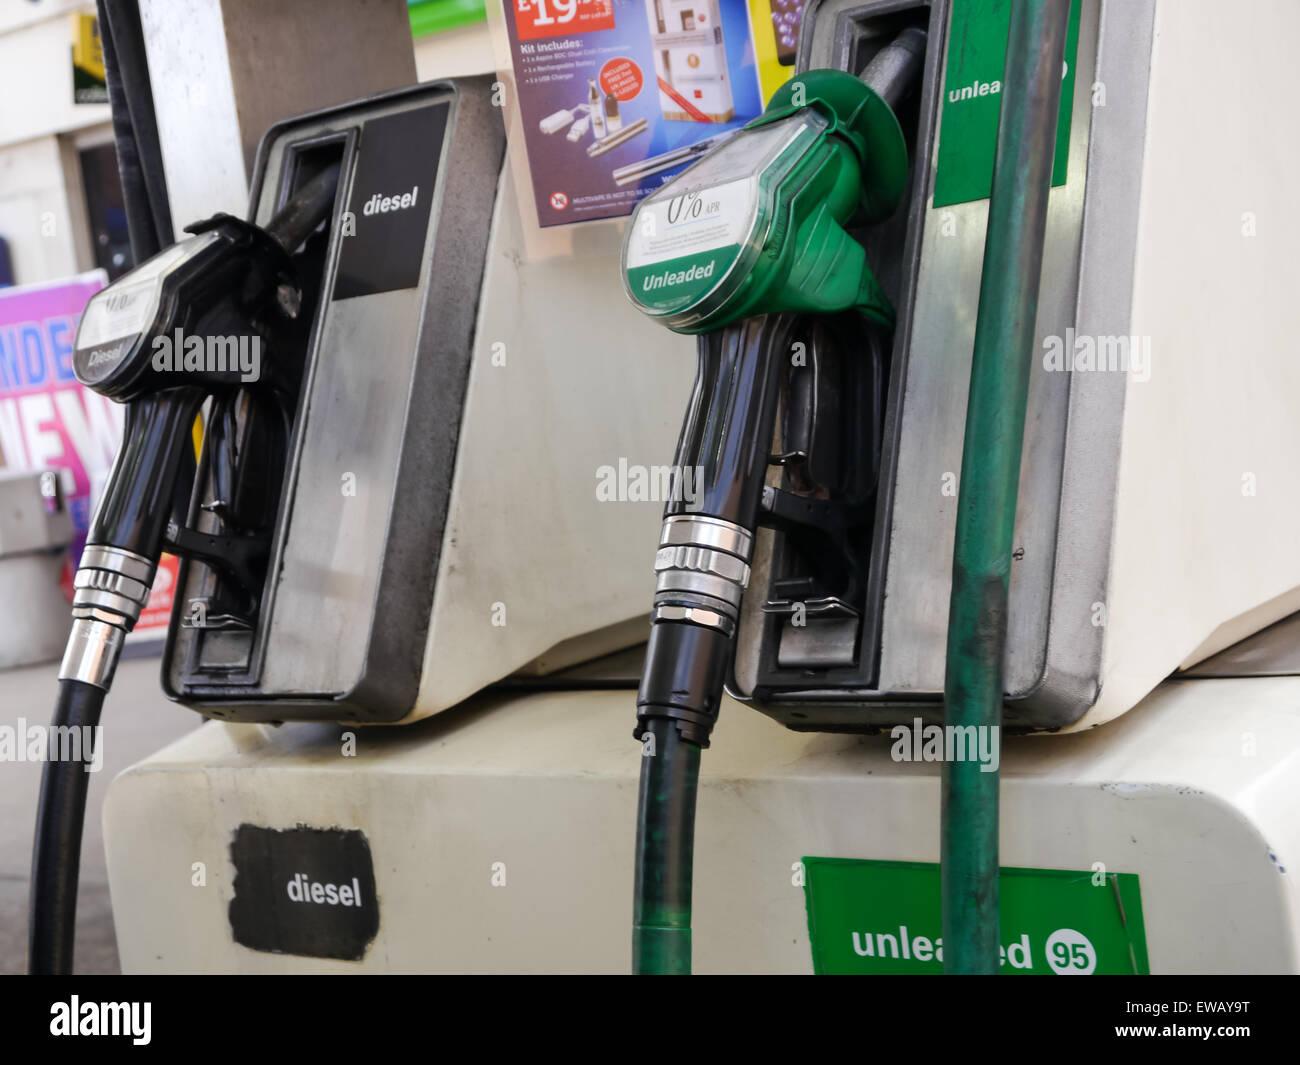 Unleaded Petrol And Diesel Fuel Pumps At A Self Service Petrol